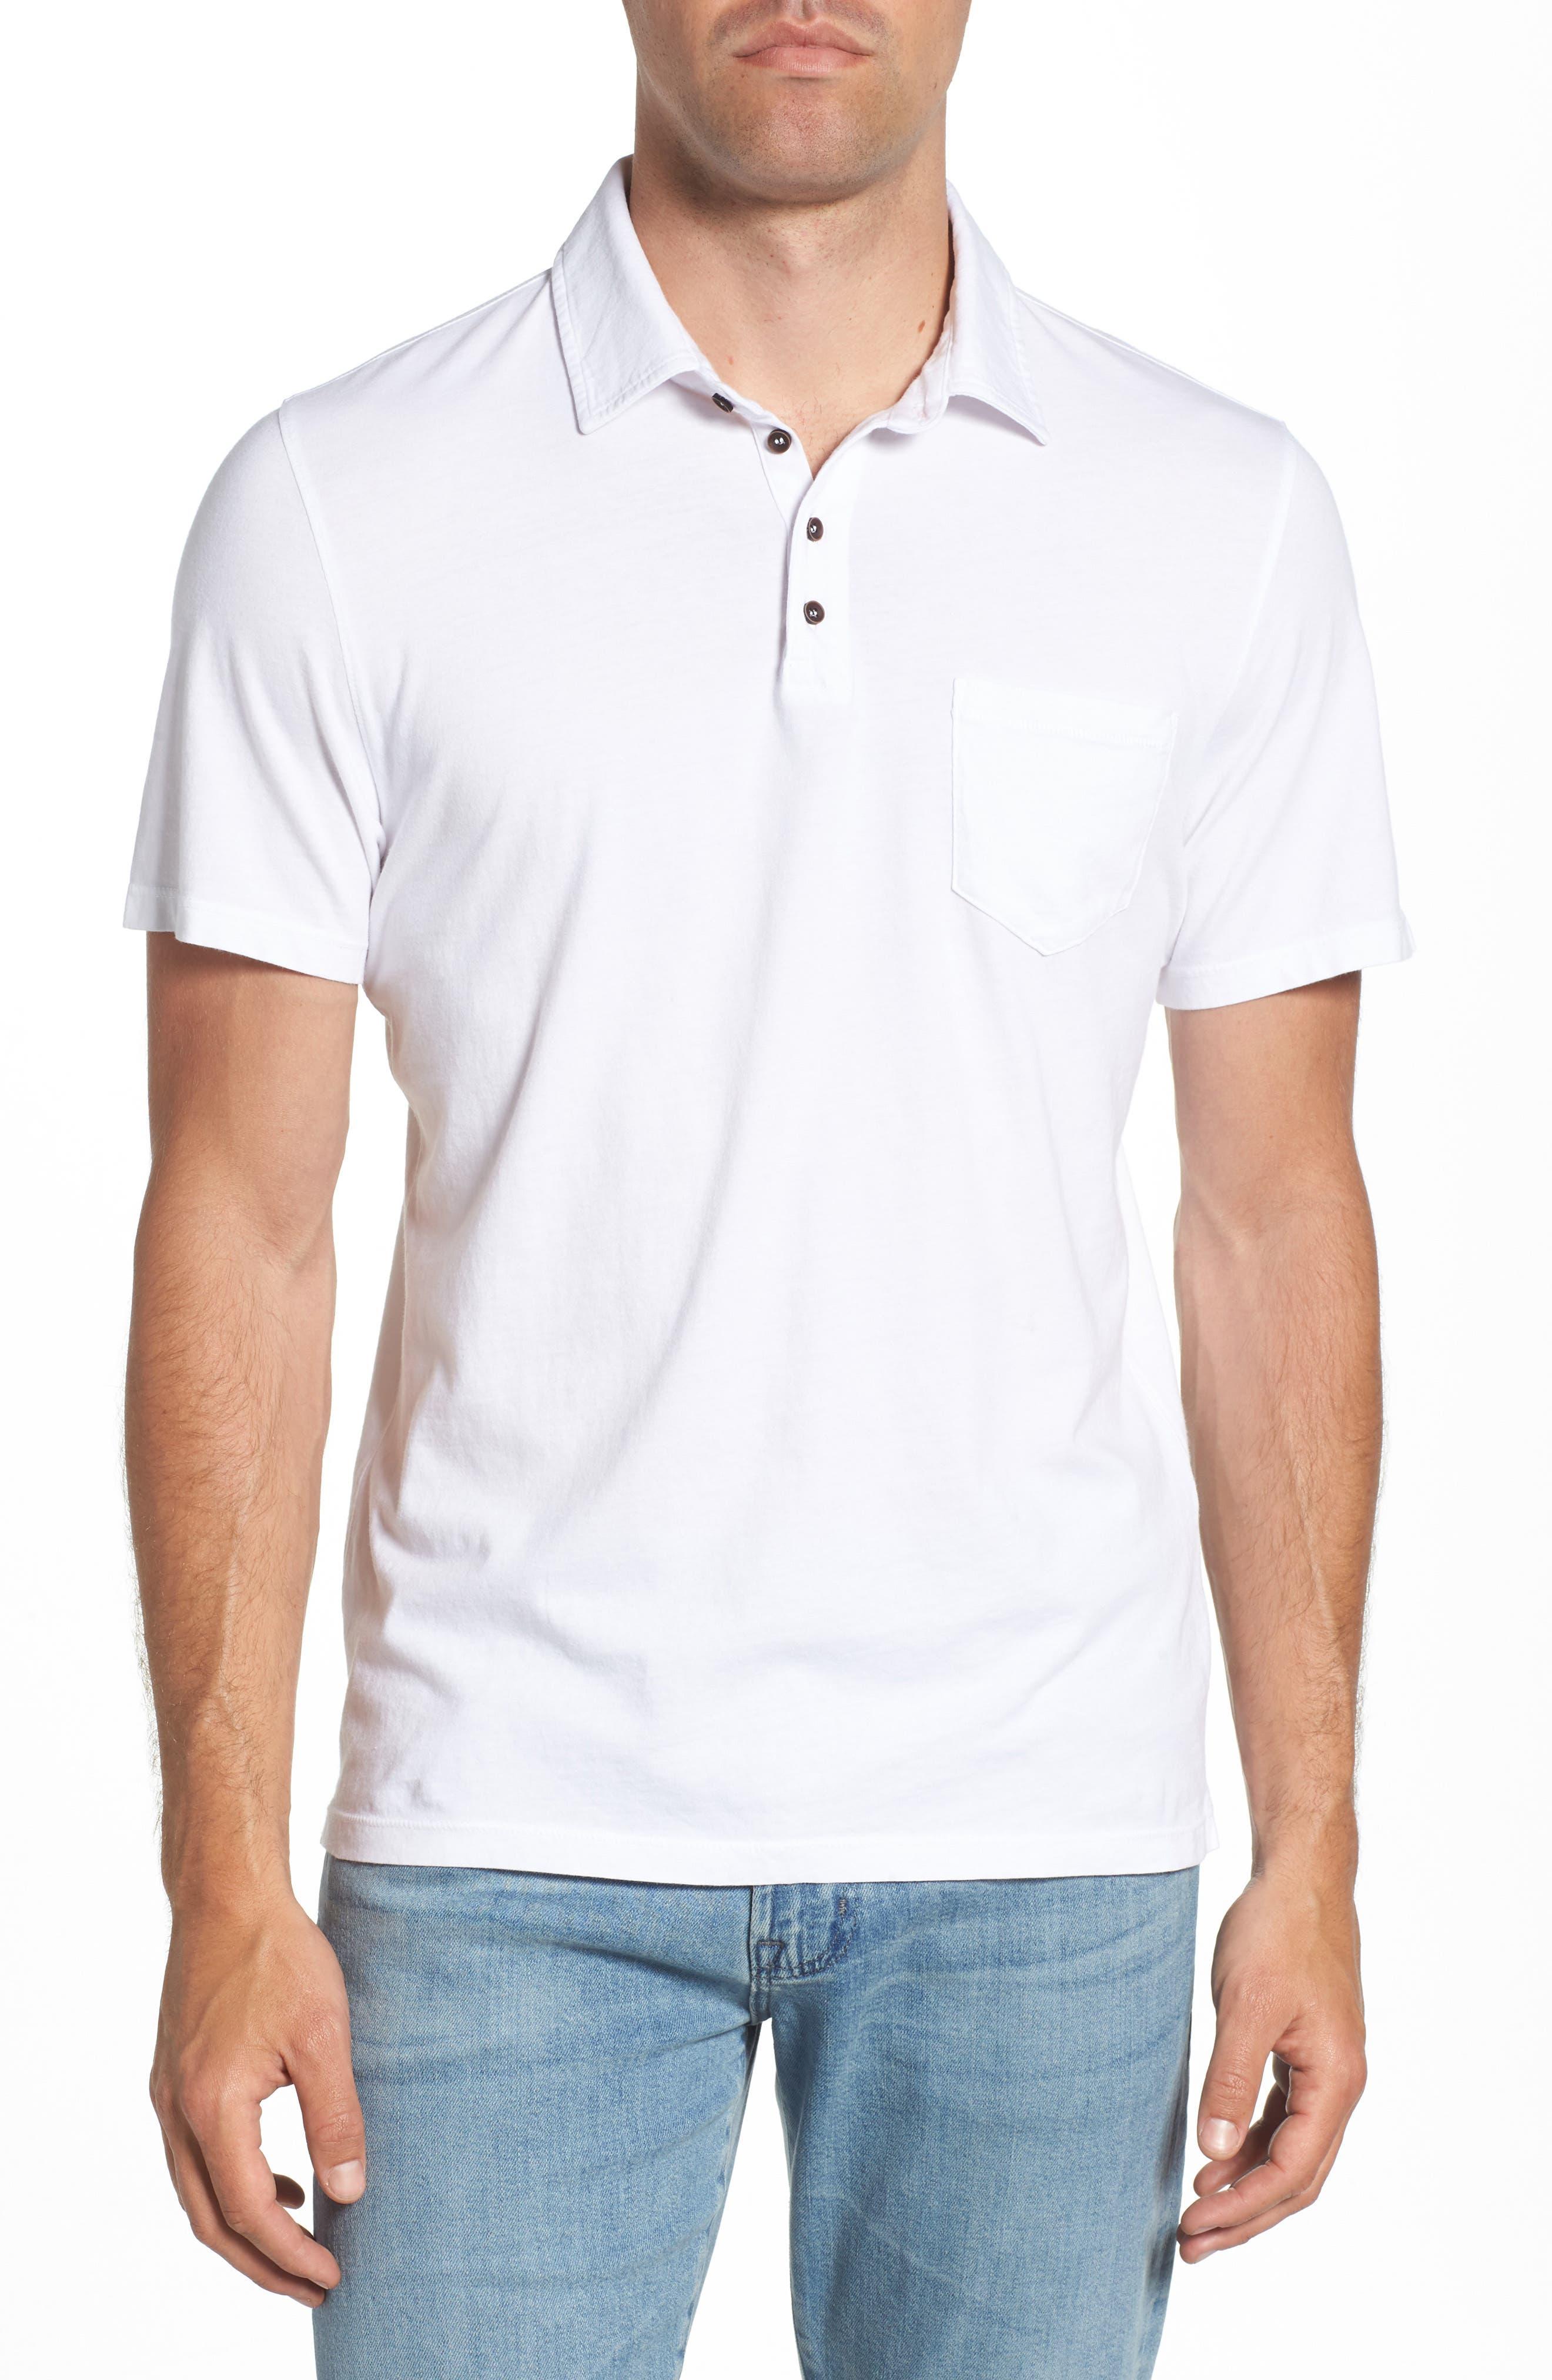 M.SINGER Regular Fit Pocket Polo, Main, color, WHITE